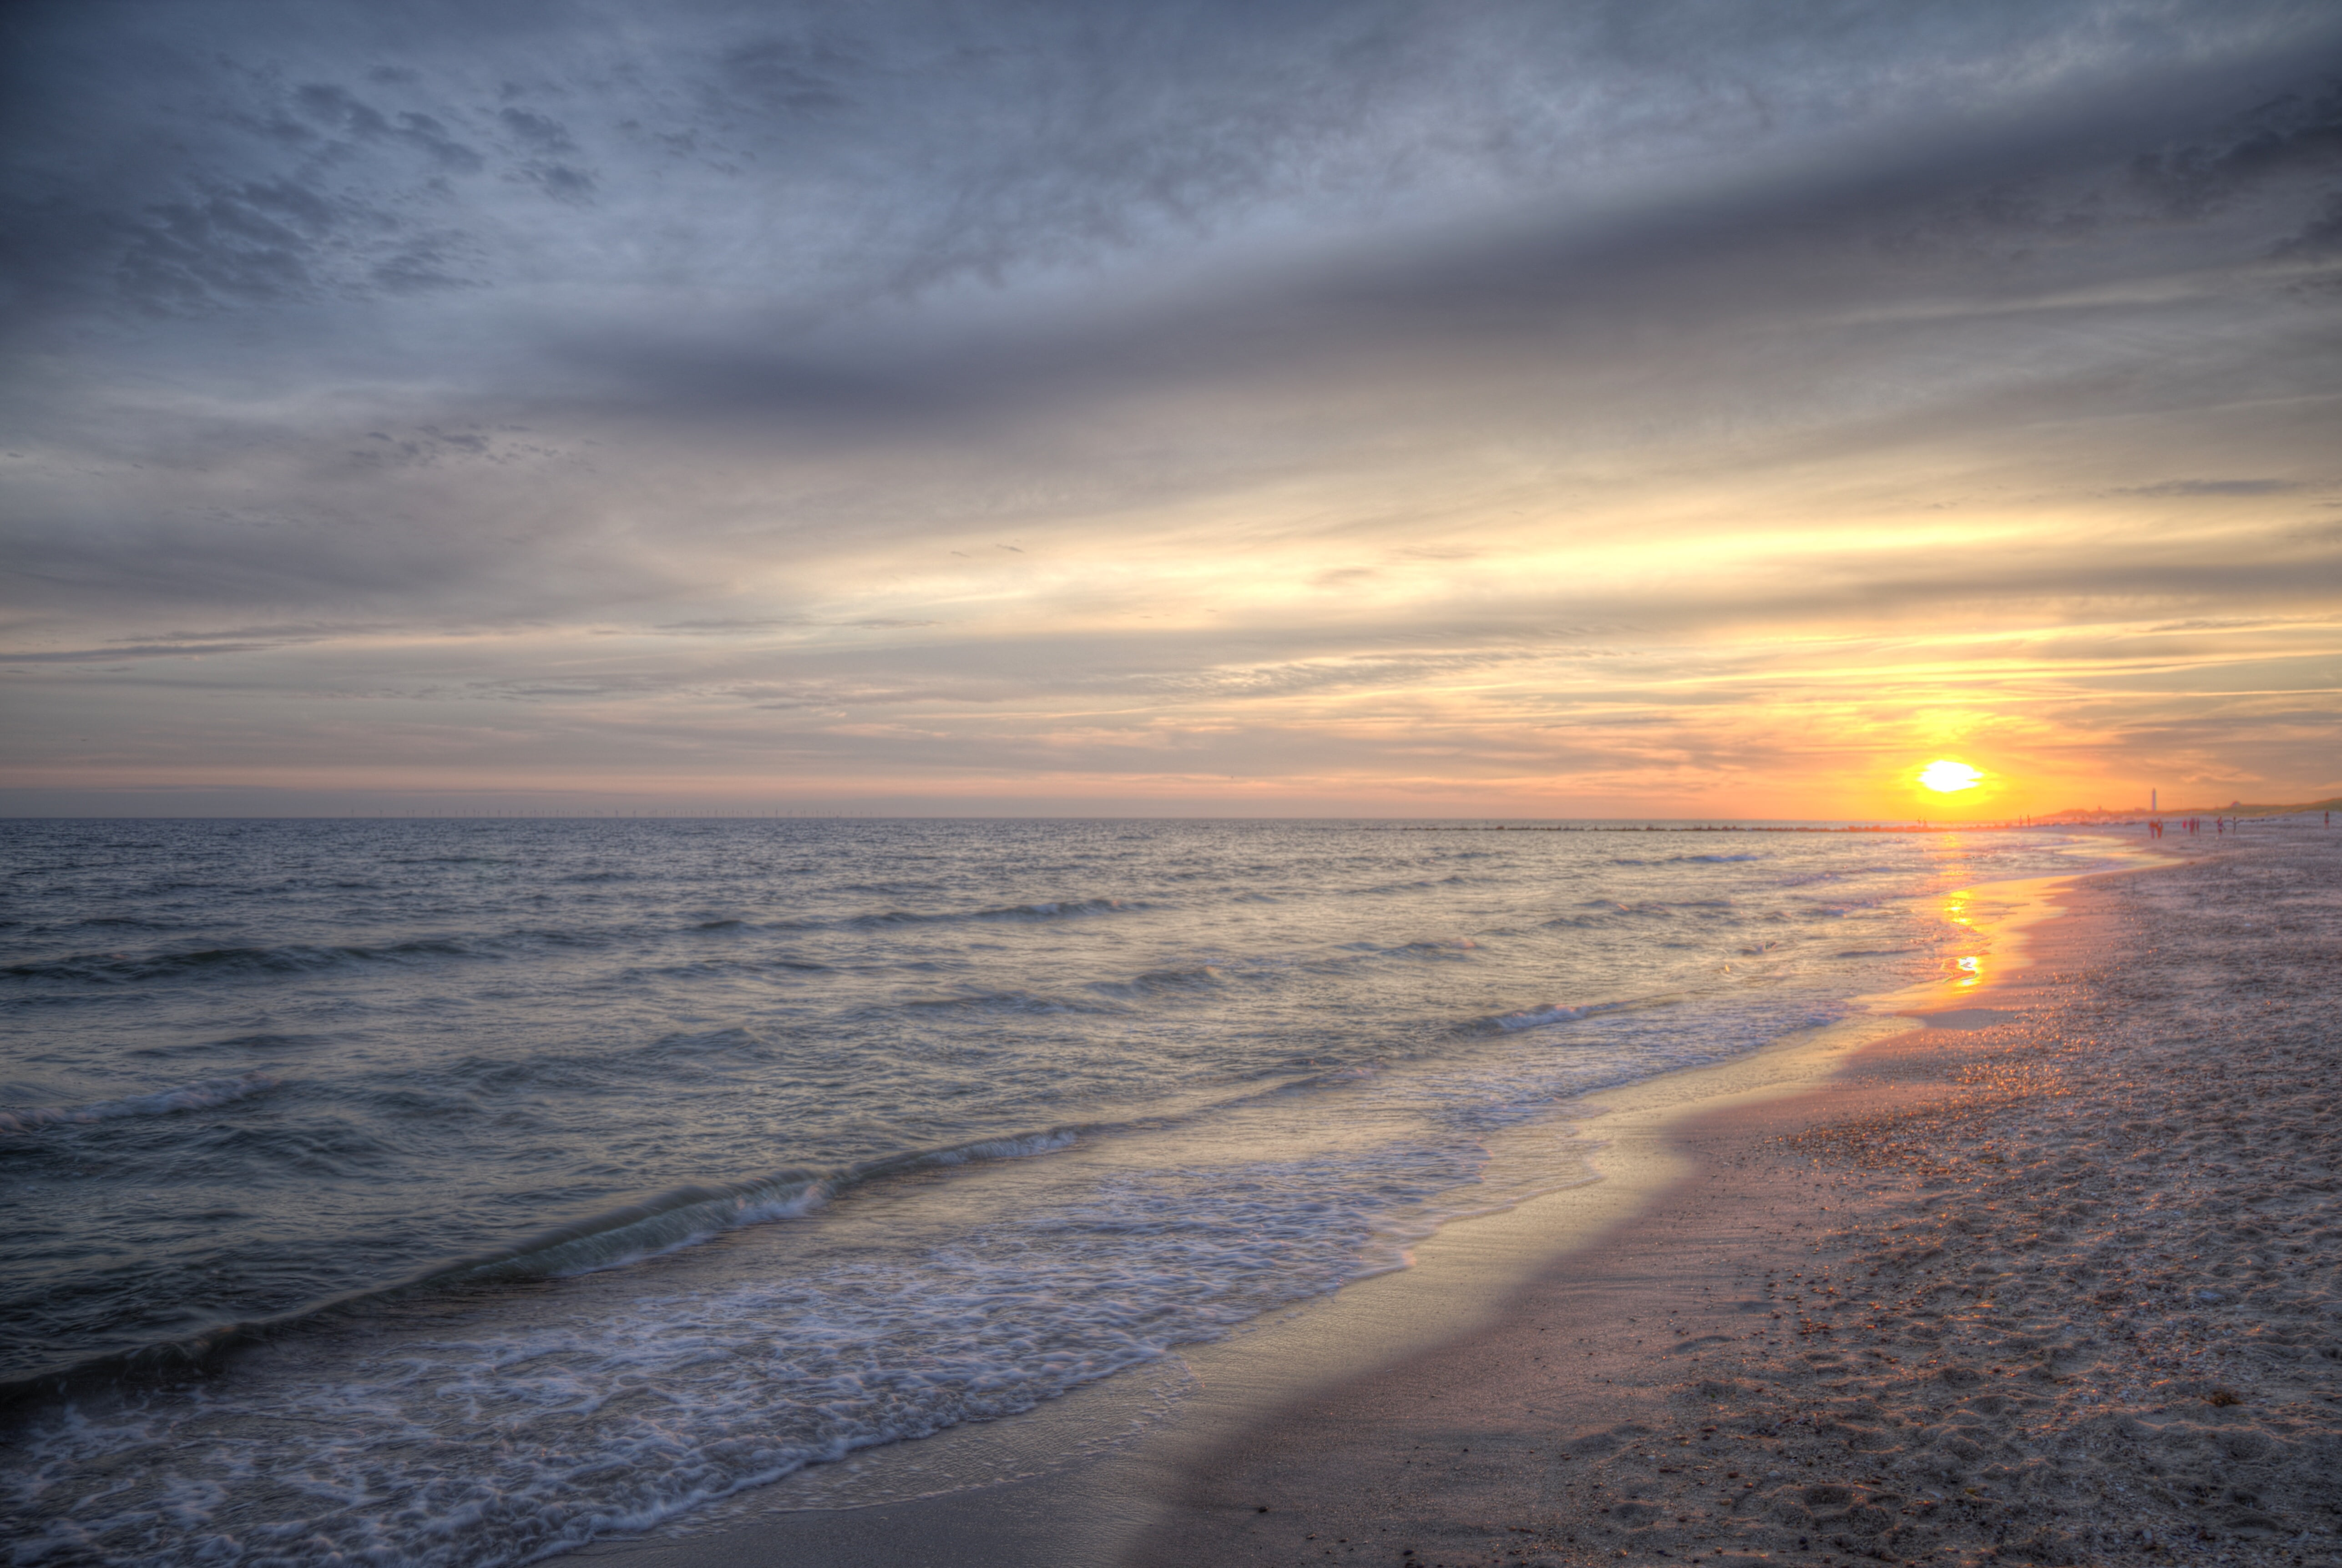 Ocean near seashore during sunrise HD wallpaper | Wallpaper Flare